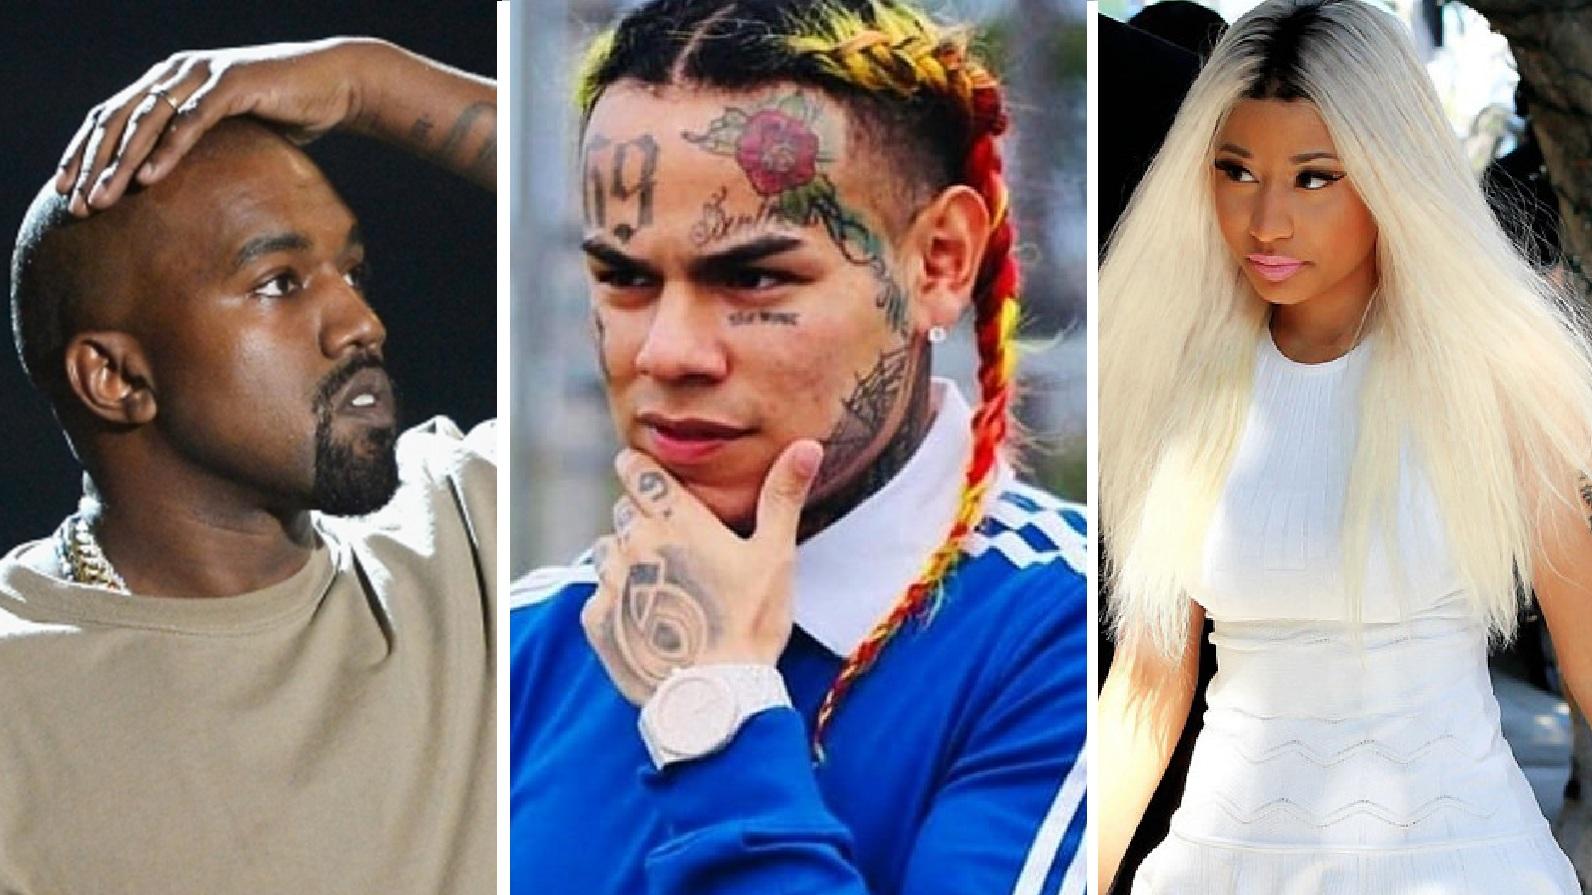 Gunshots Fired At Tekashi 6ix9ine, Kanye West, Nicki Minaj Music Video Shoot